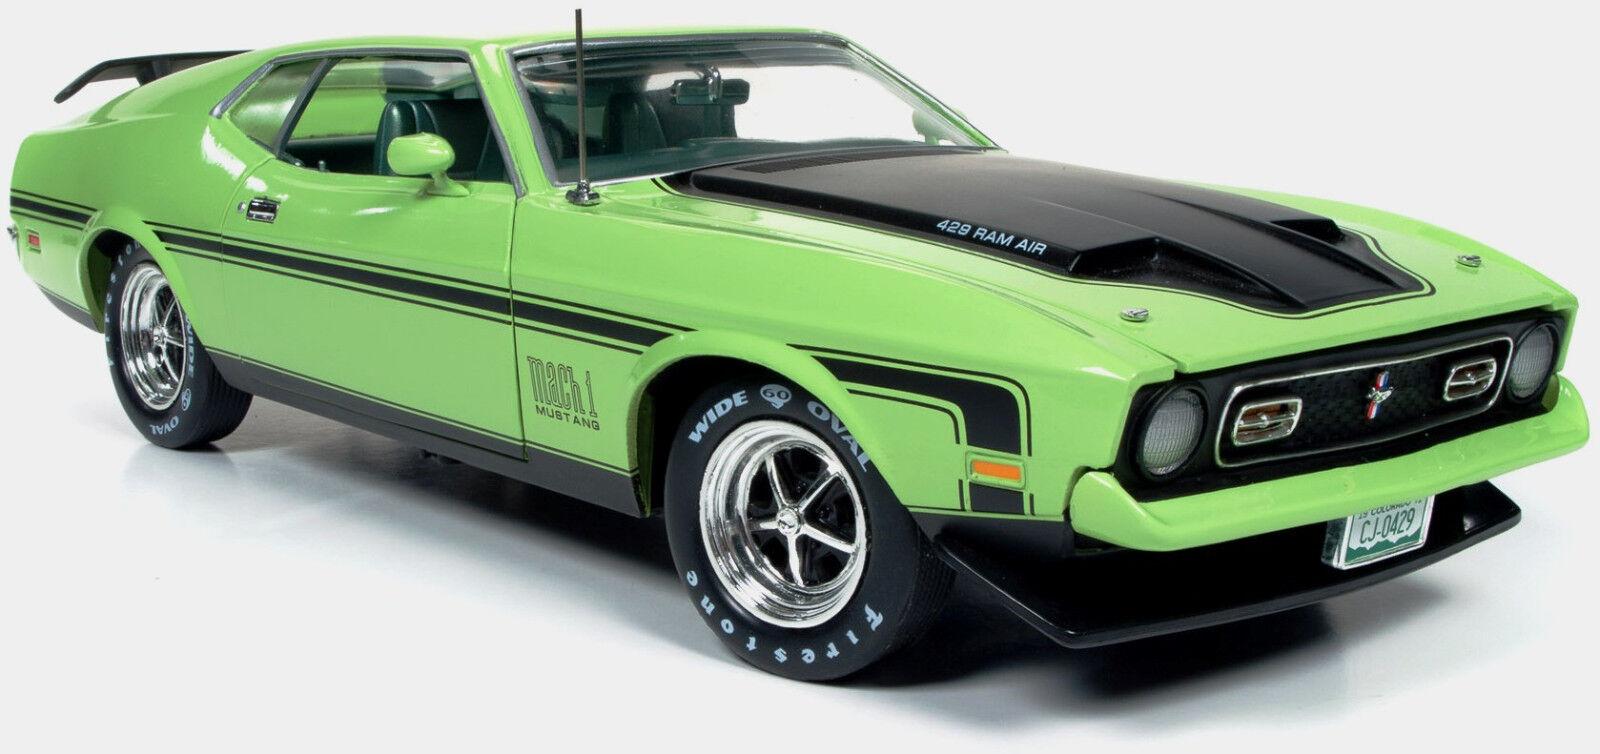 FORD MUSTANG 1971 Mach 1 Vert citron 1 18 Auto World 1069